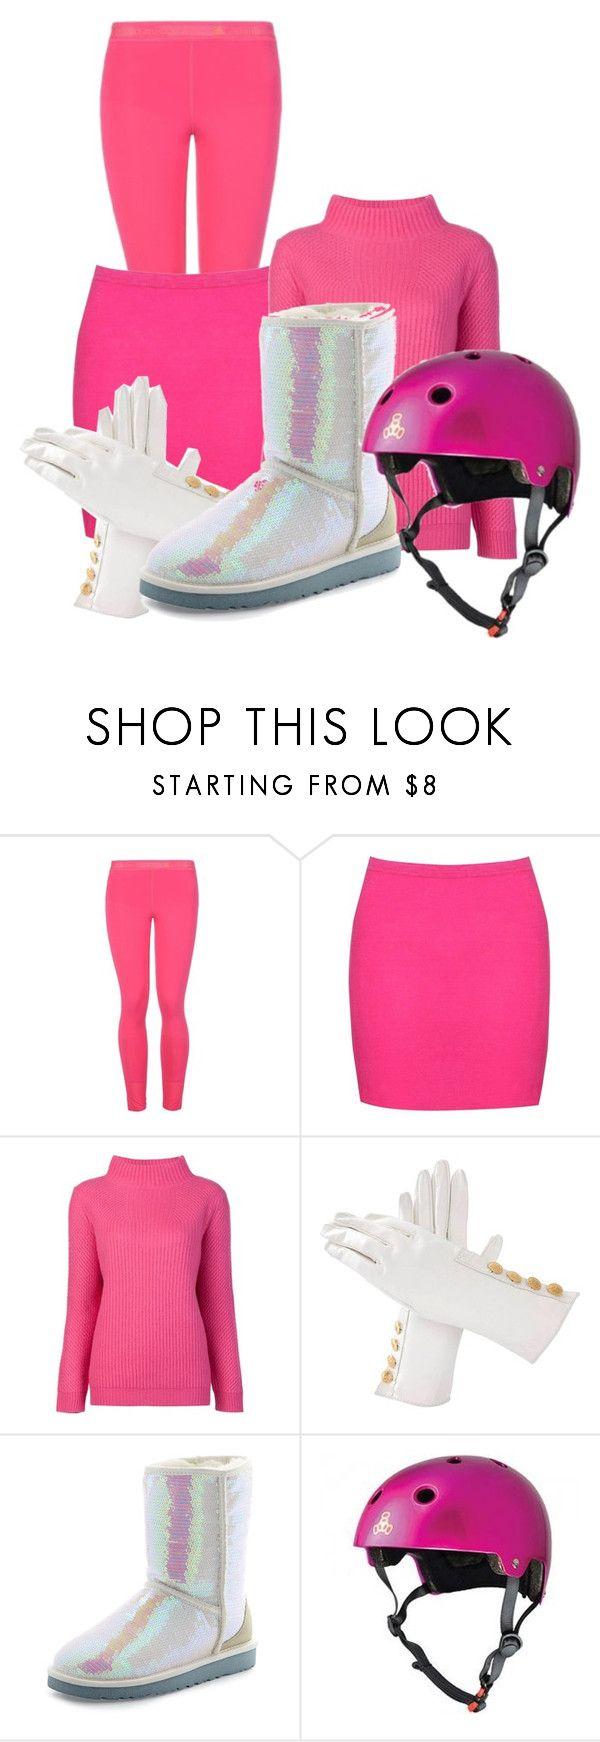 """Homemade Pink Power Ranger Costume"" by dairyqueen55 ❤ liked on Polyvore featuring STELLA McCARTNEY, Boohoo, Diane Von Furstenberg, Hermès, UGG Australia and Triple Eight"